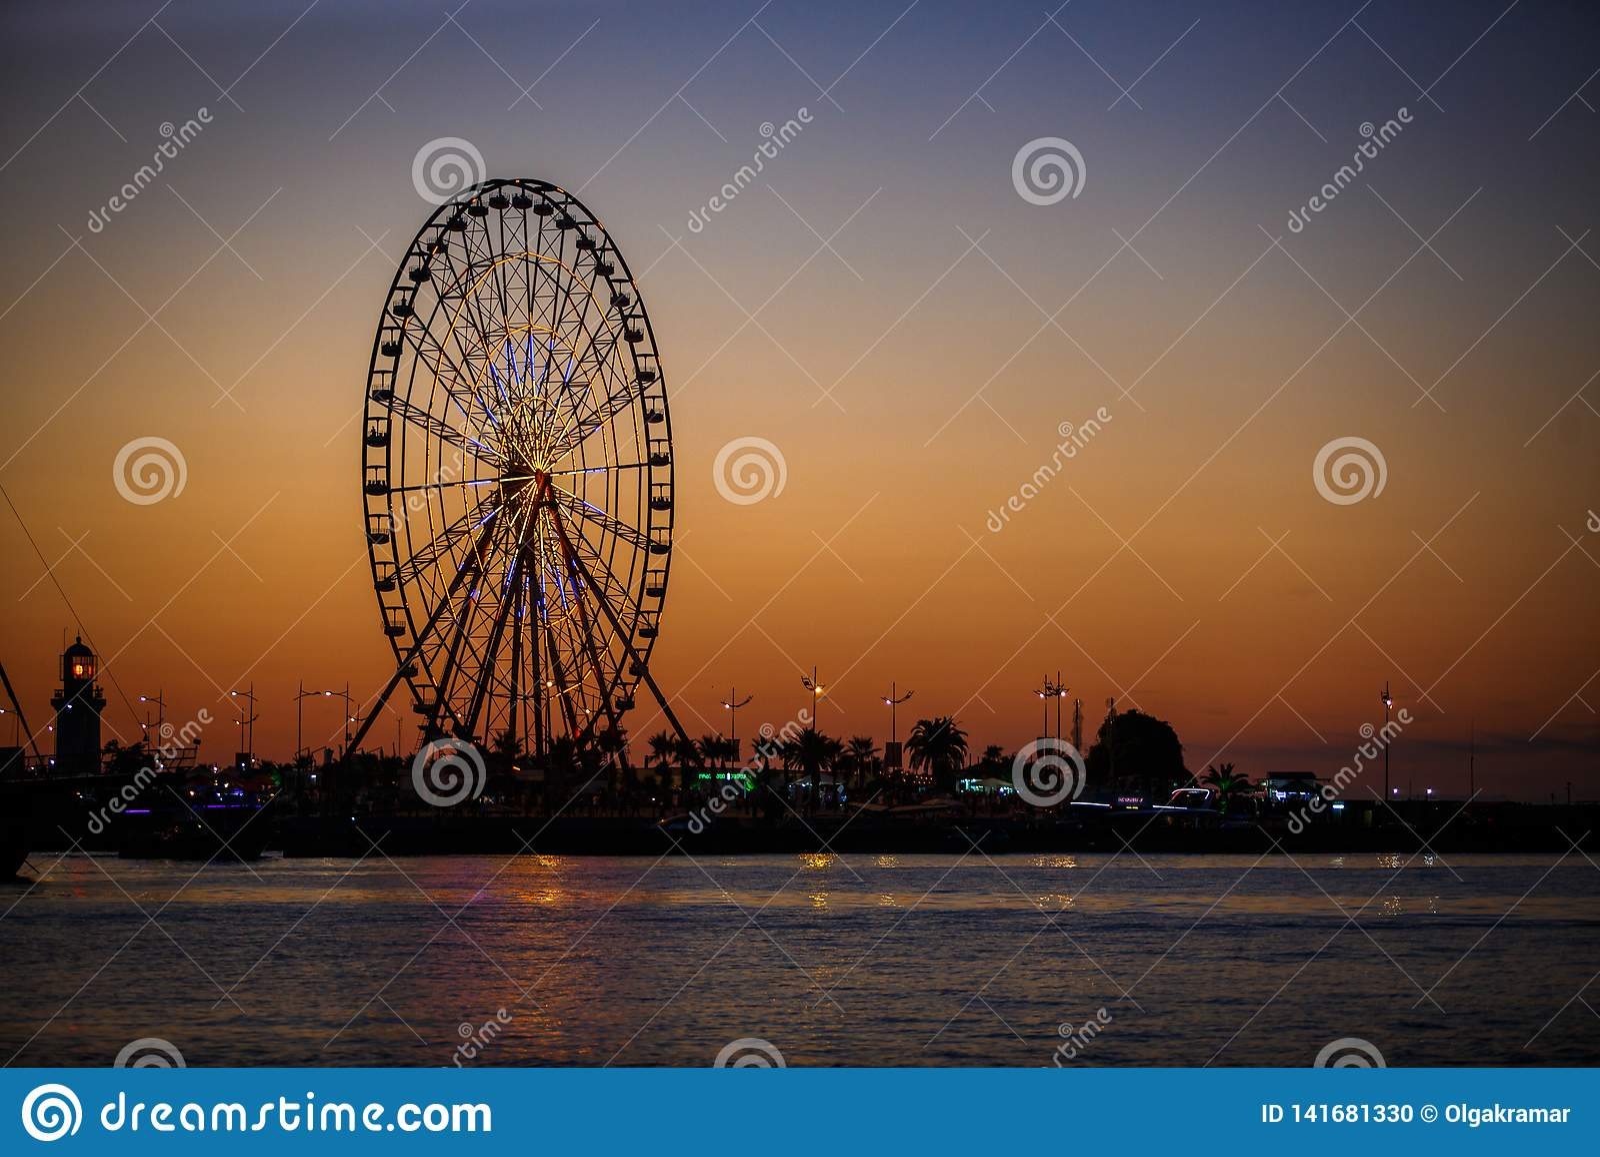 Ferris Wheel And Georgian Alphabet Tower On Orange Sunset Background Editorial Image Image Of Embankment Blue 141681330